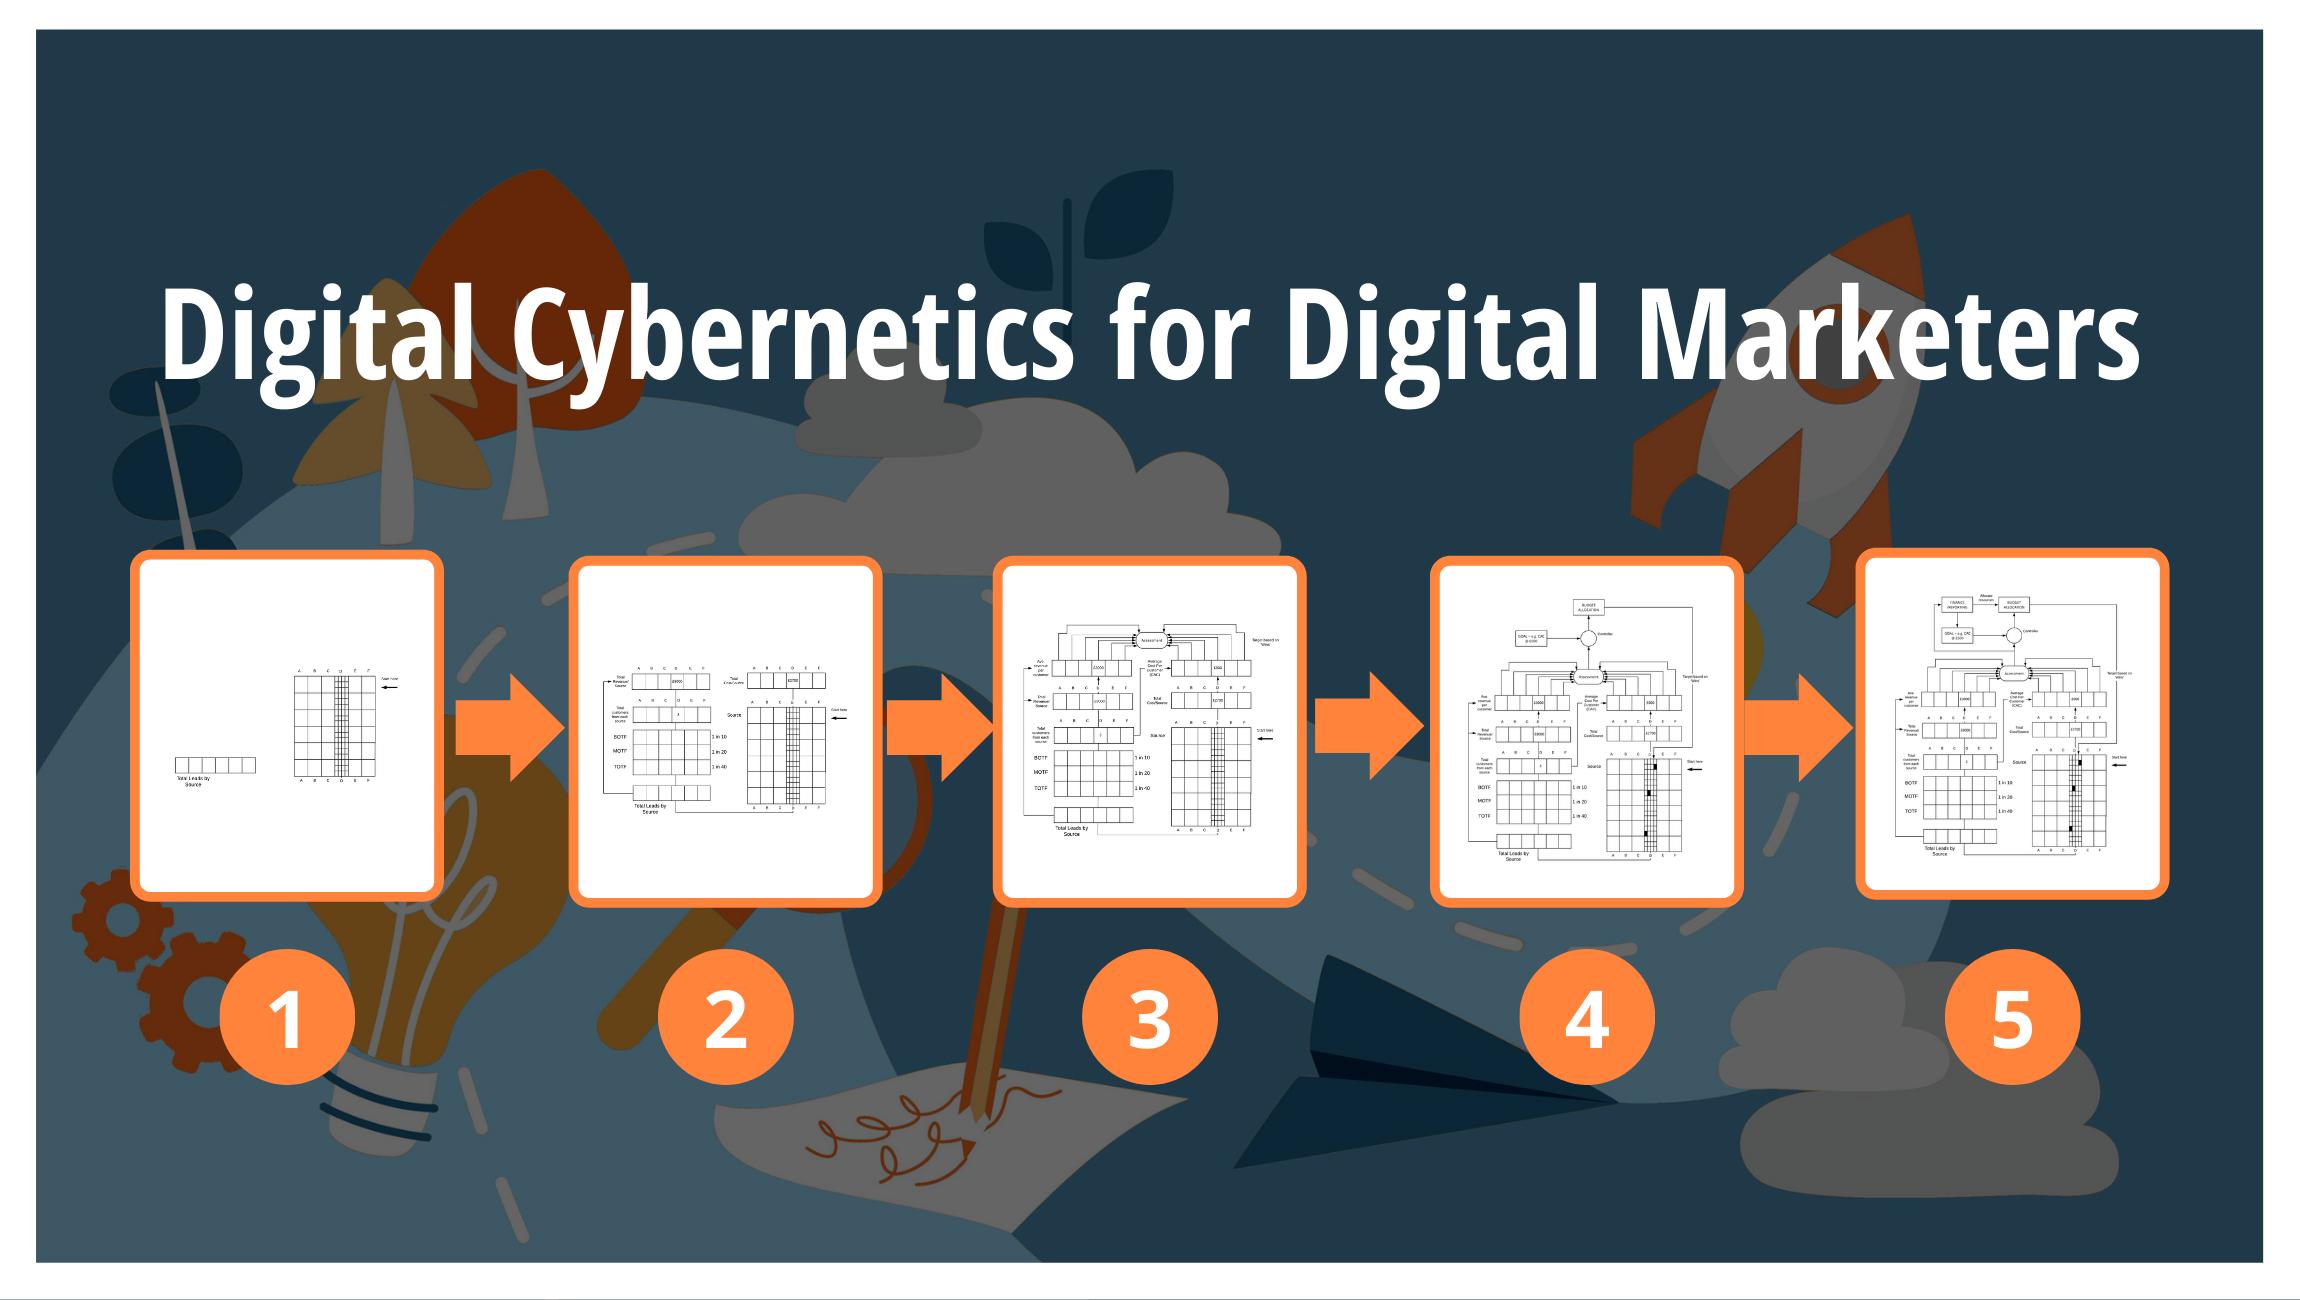 Digital Cybernetics for Digital Marketers (1)